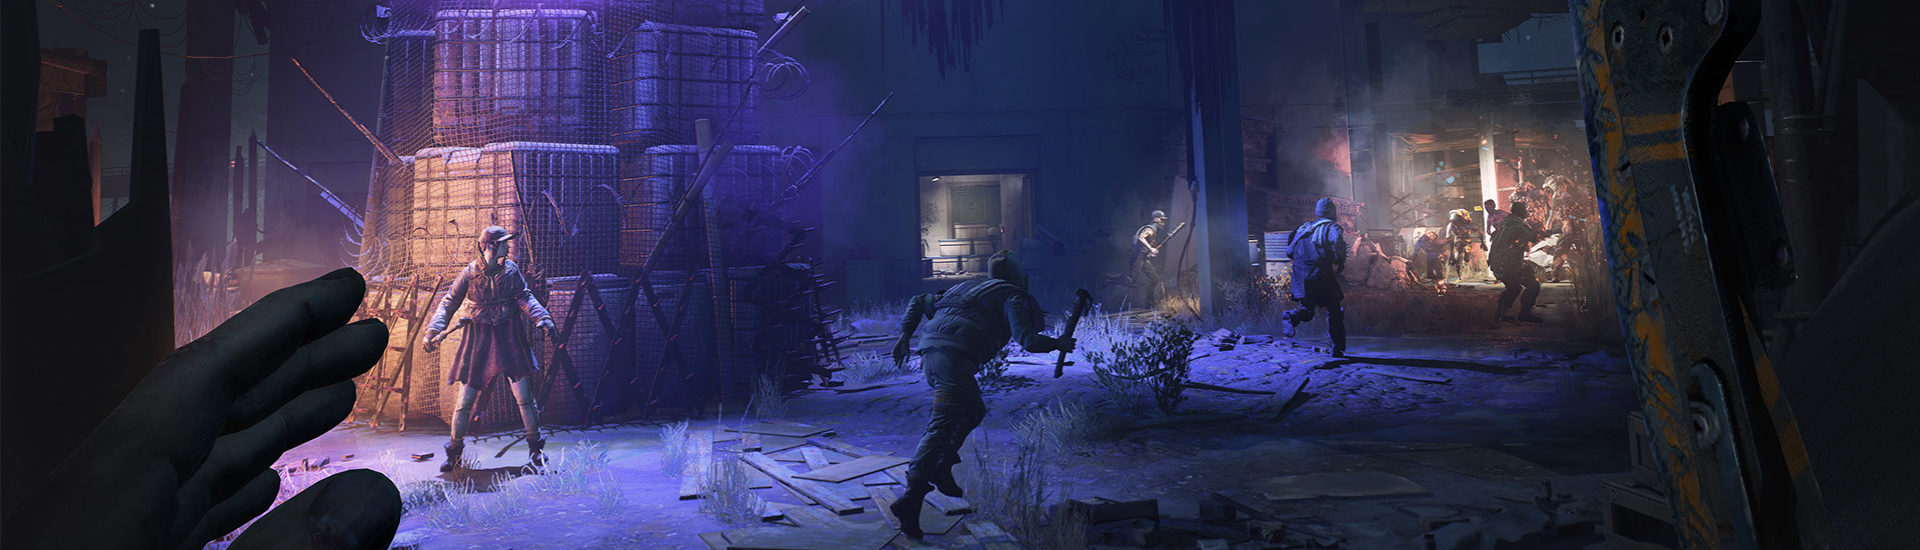 Dying Light 2: Alle Infos zum Zombie-Titel